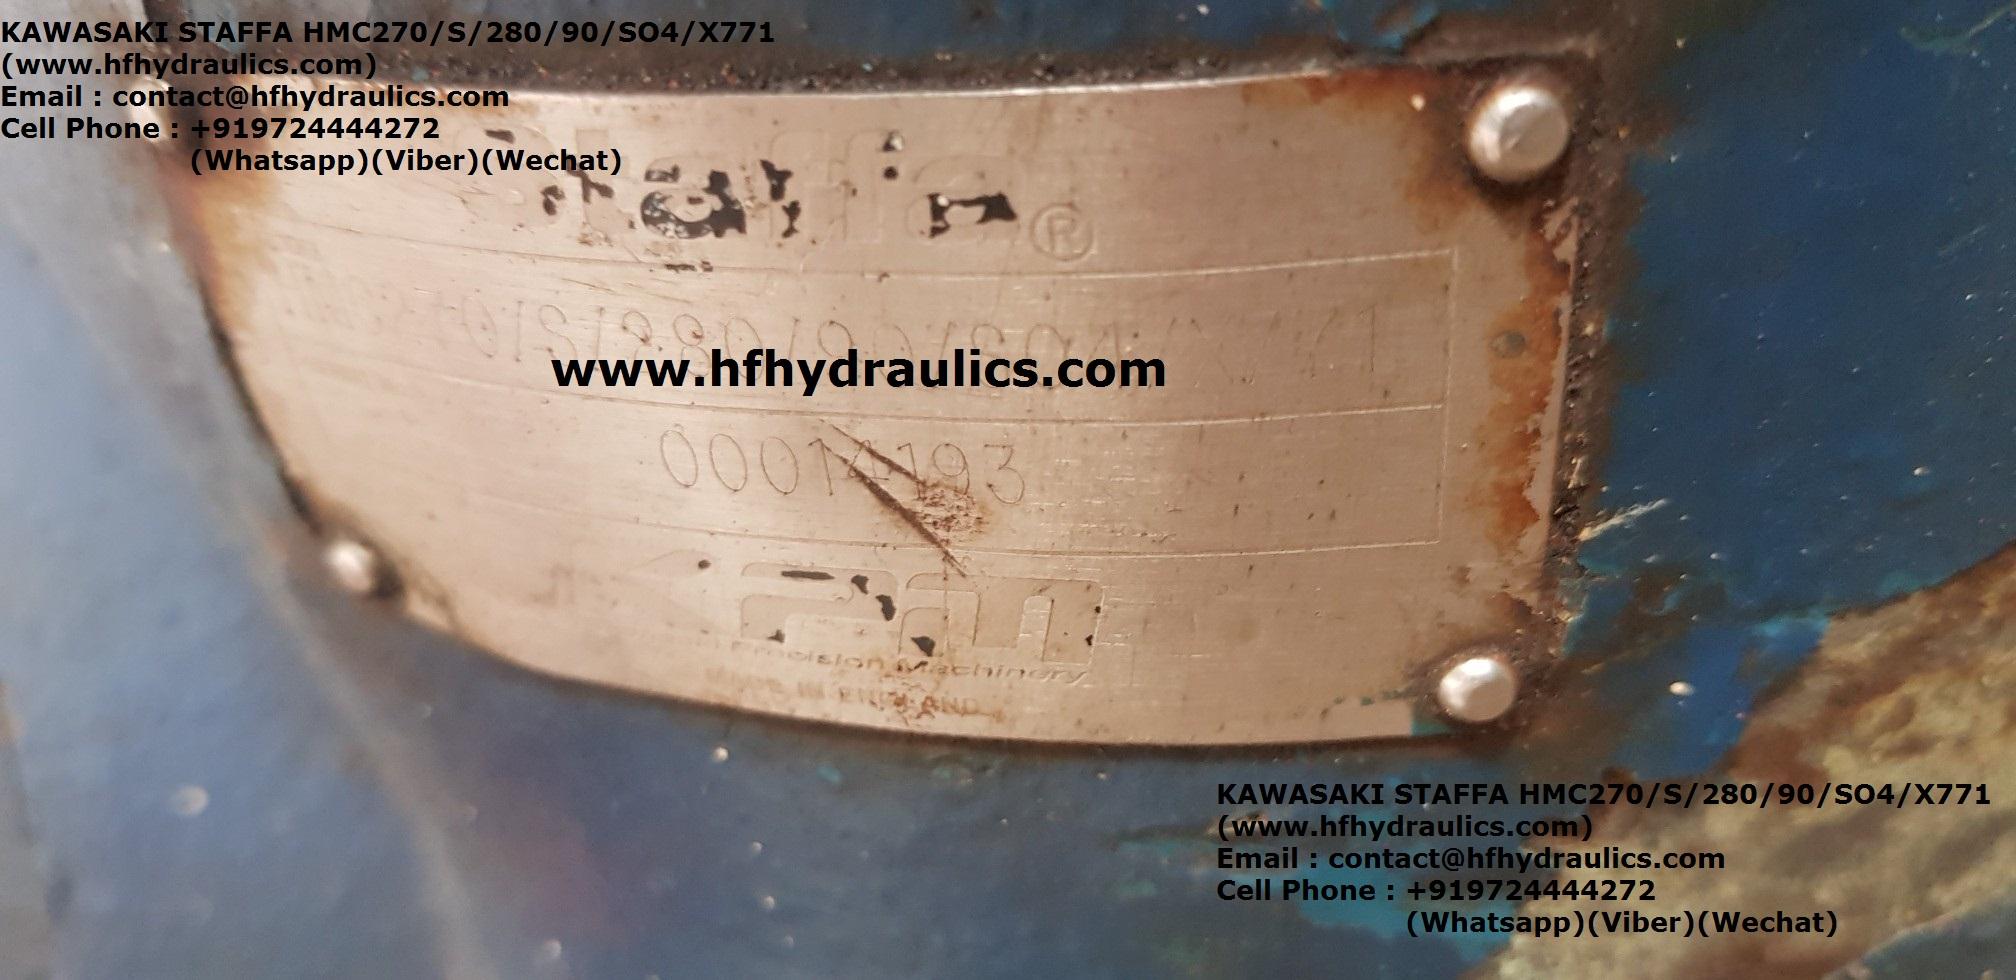 KAWASAKI STAFFA HMC270/S/280/90/SO4 MODEL WINCH HYDRAULIC MOTOR (HF HYDRAULICS, INDIA)